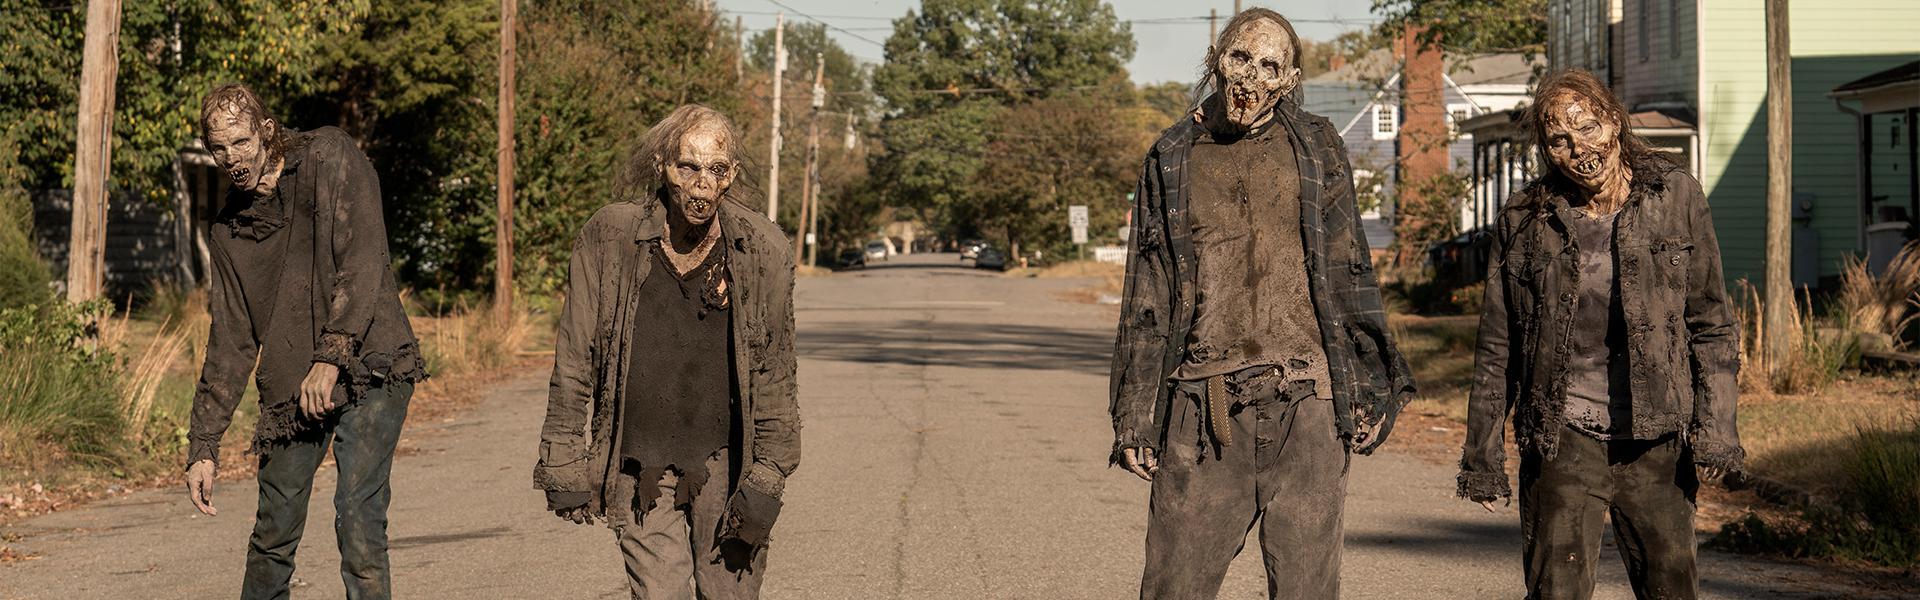 Halloween Watching 2020 What Brief is Watching: Halloween 2020| Promax Brief